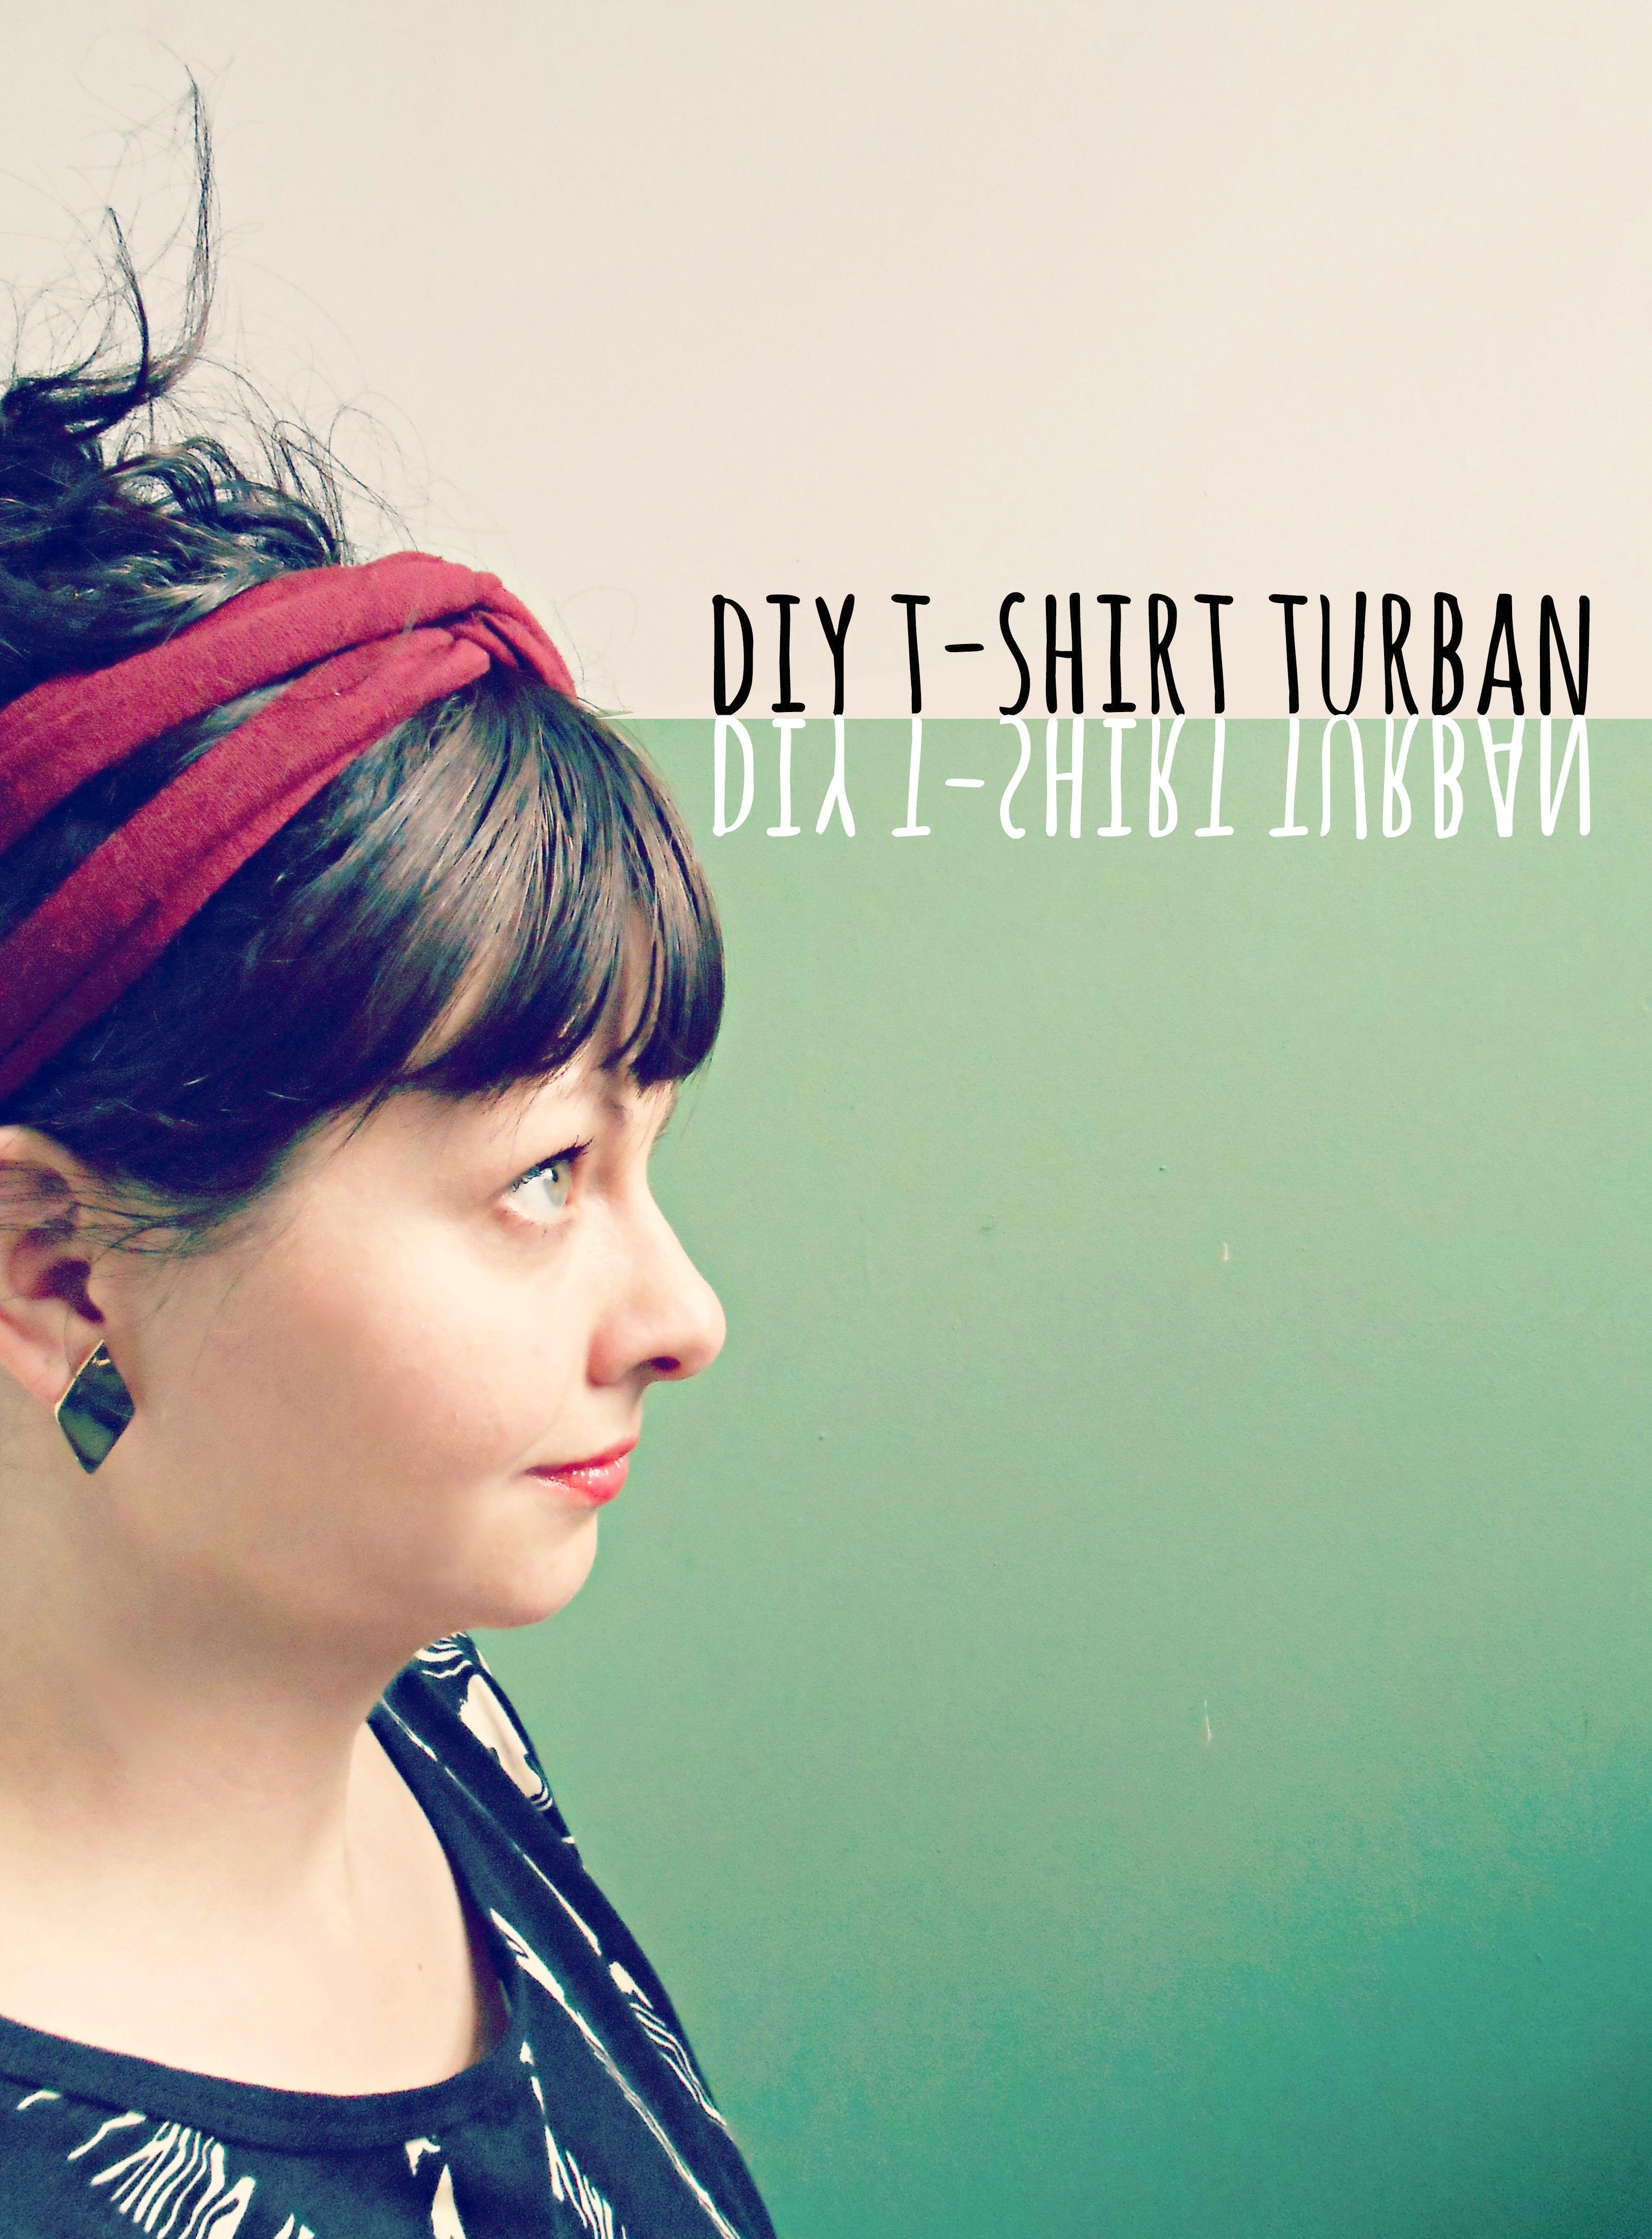 Make Turban Out of Shirt Diy No-sew T-shirt Turban